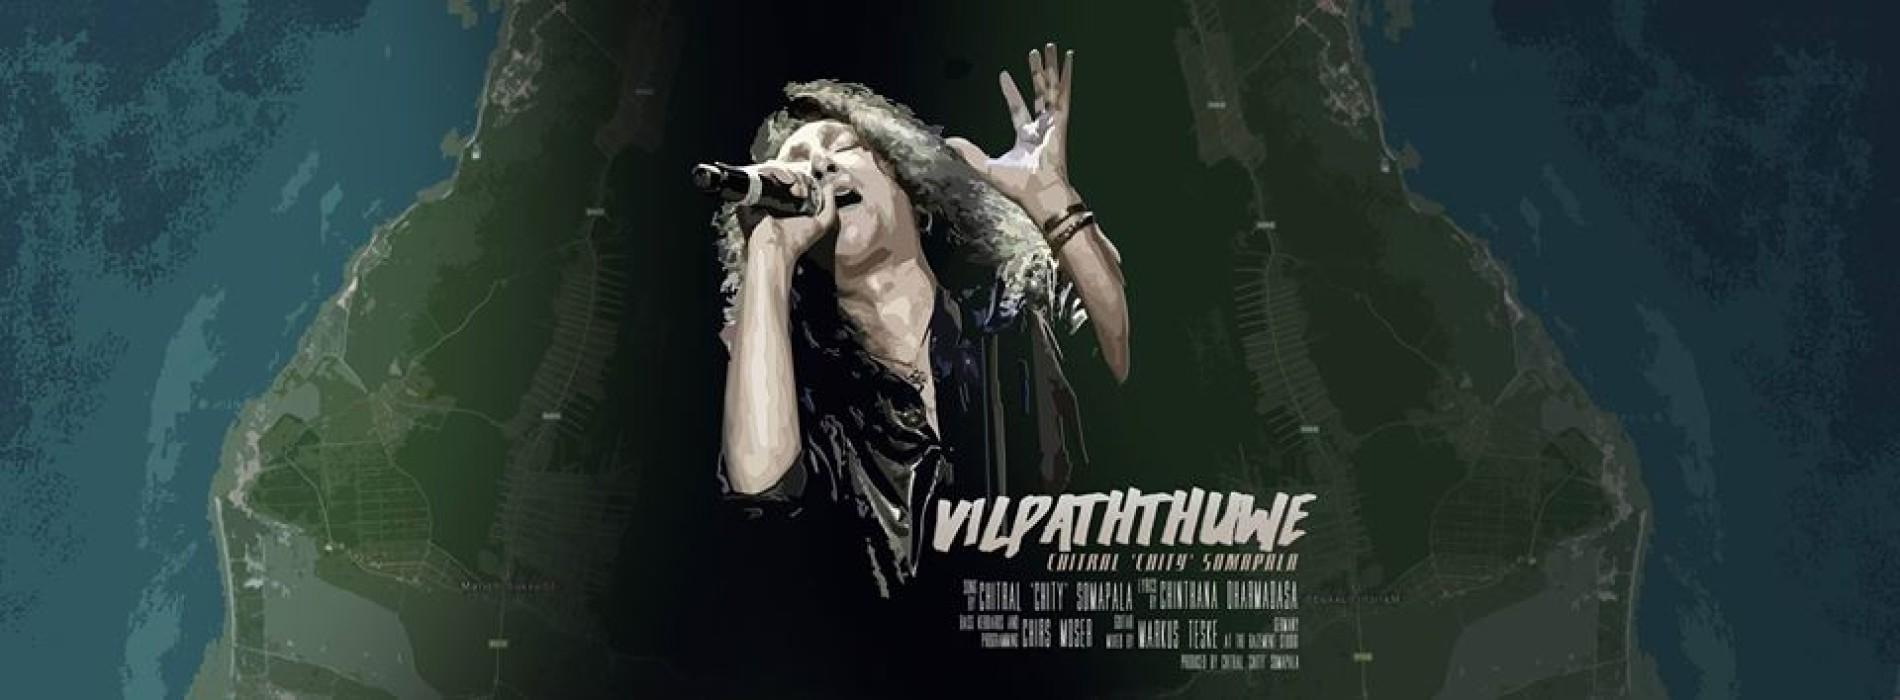 Chitral Somapala & Chinthana Dharmadasa – Vilpattuwe